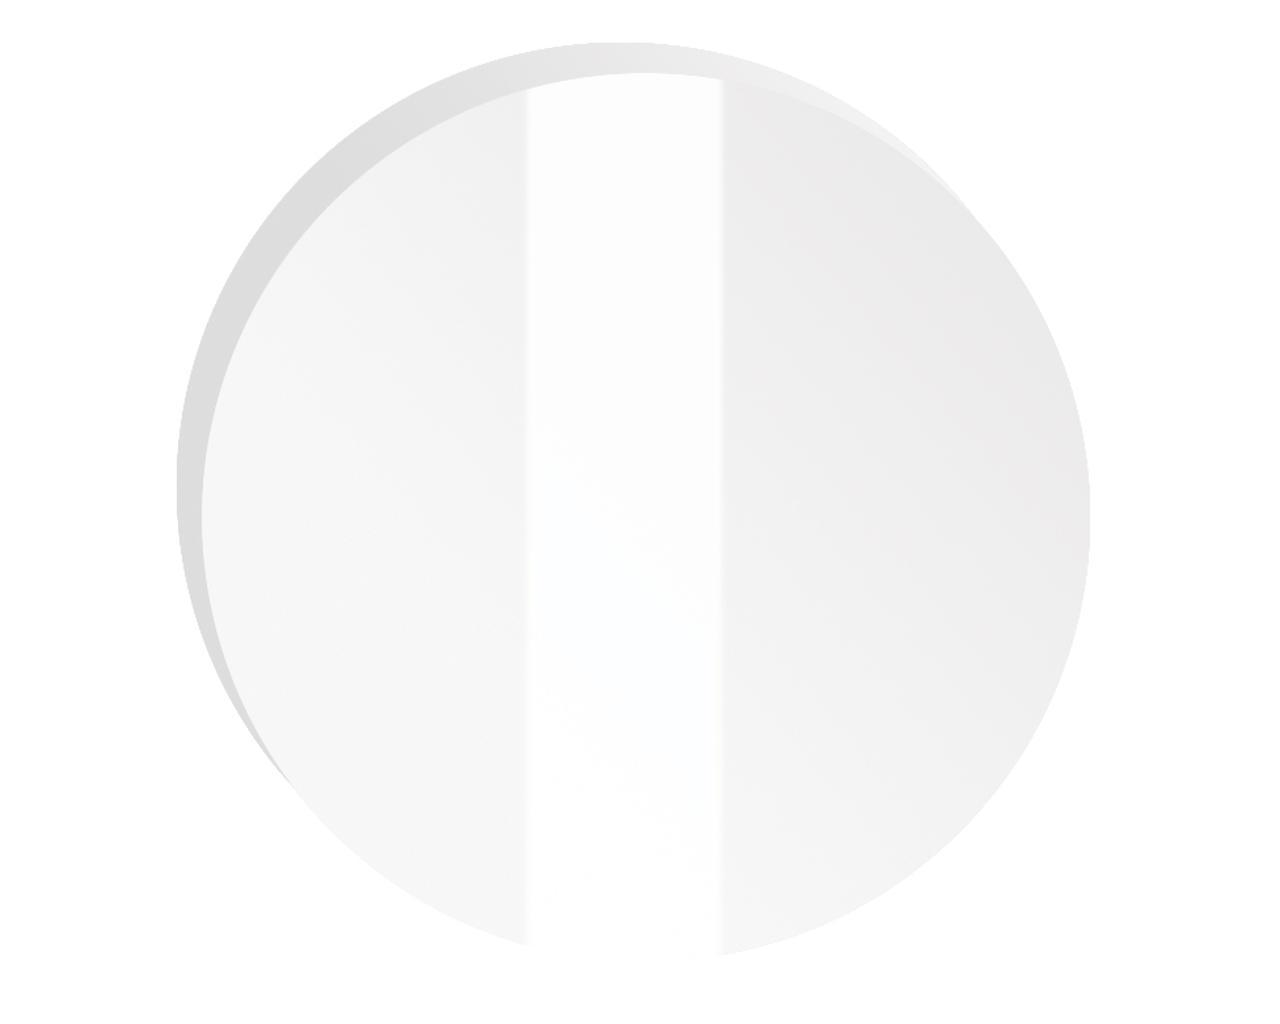 Стекло прозрачное круглое диаметр 49,5 мм